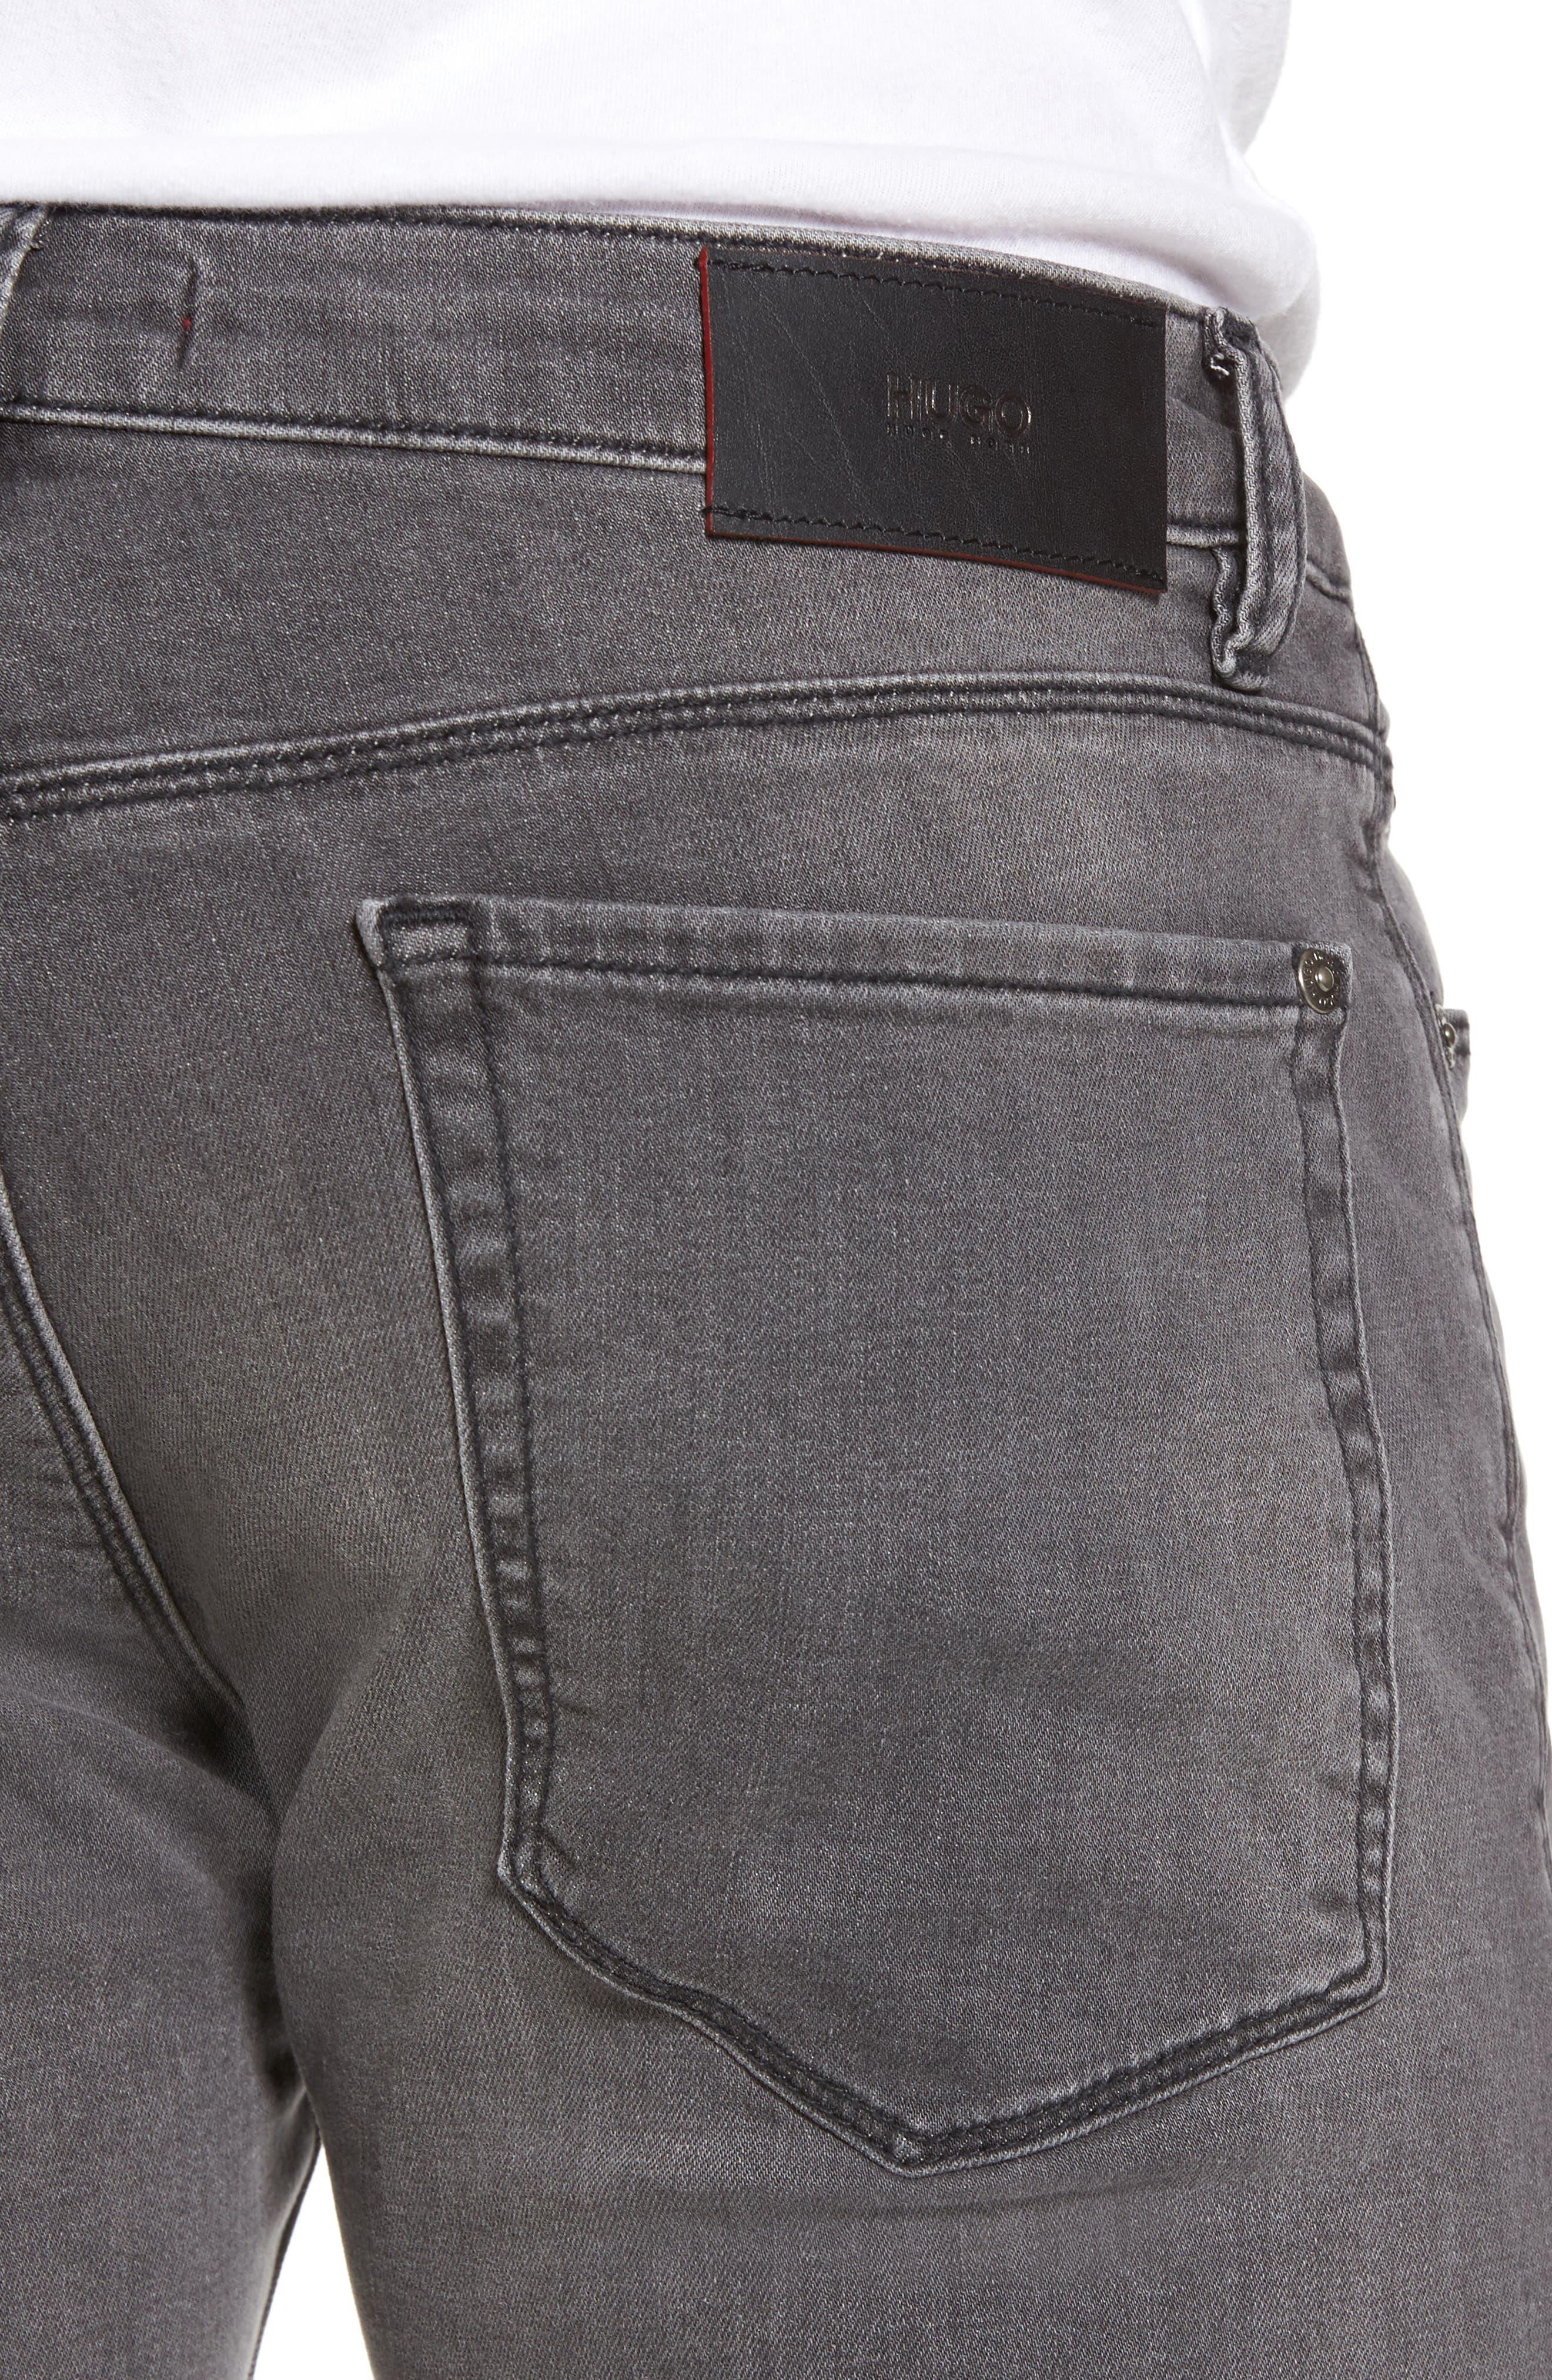 Hugo Boss 708 Stonewash Denim Jeans,                             Alternate thumbnail 4, color,                             021